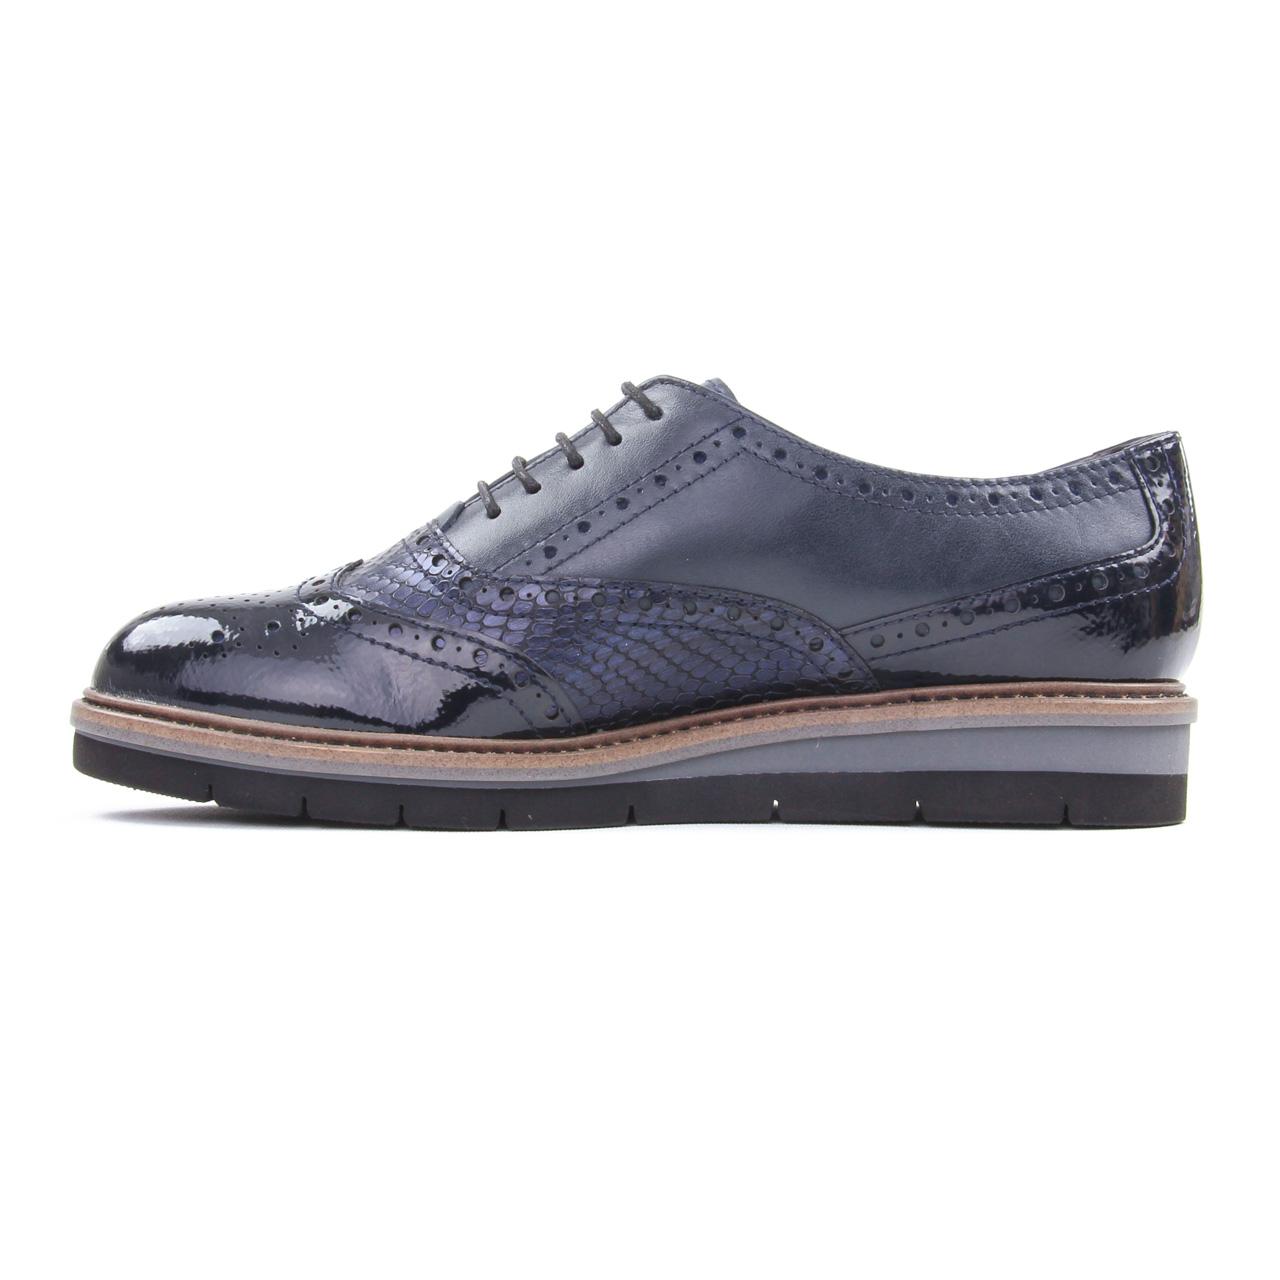 Chaussures Ara noires Casual femme  44 EU cWmqRNji